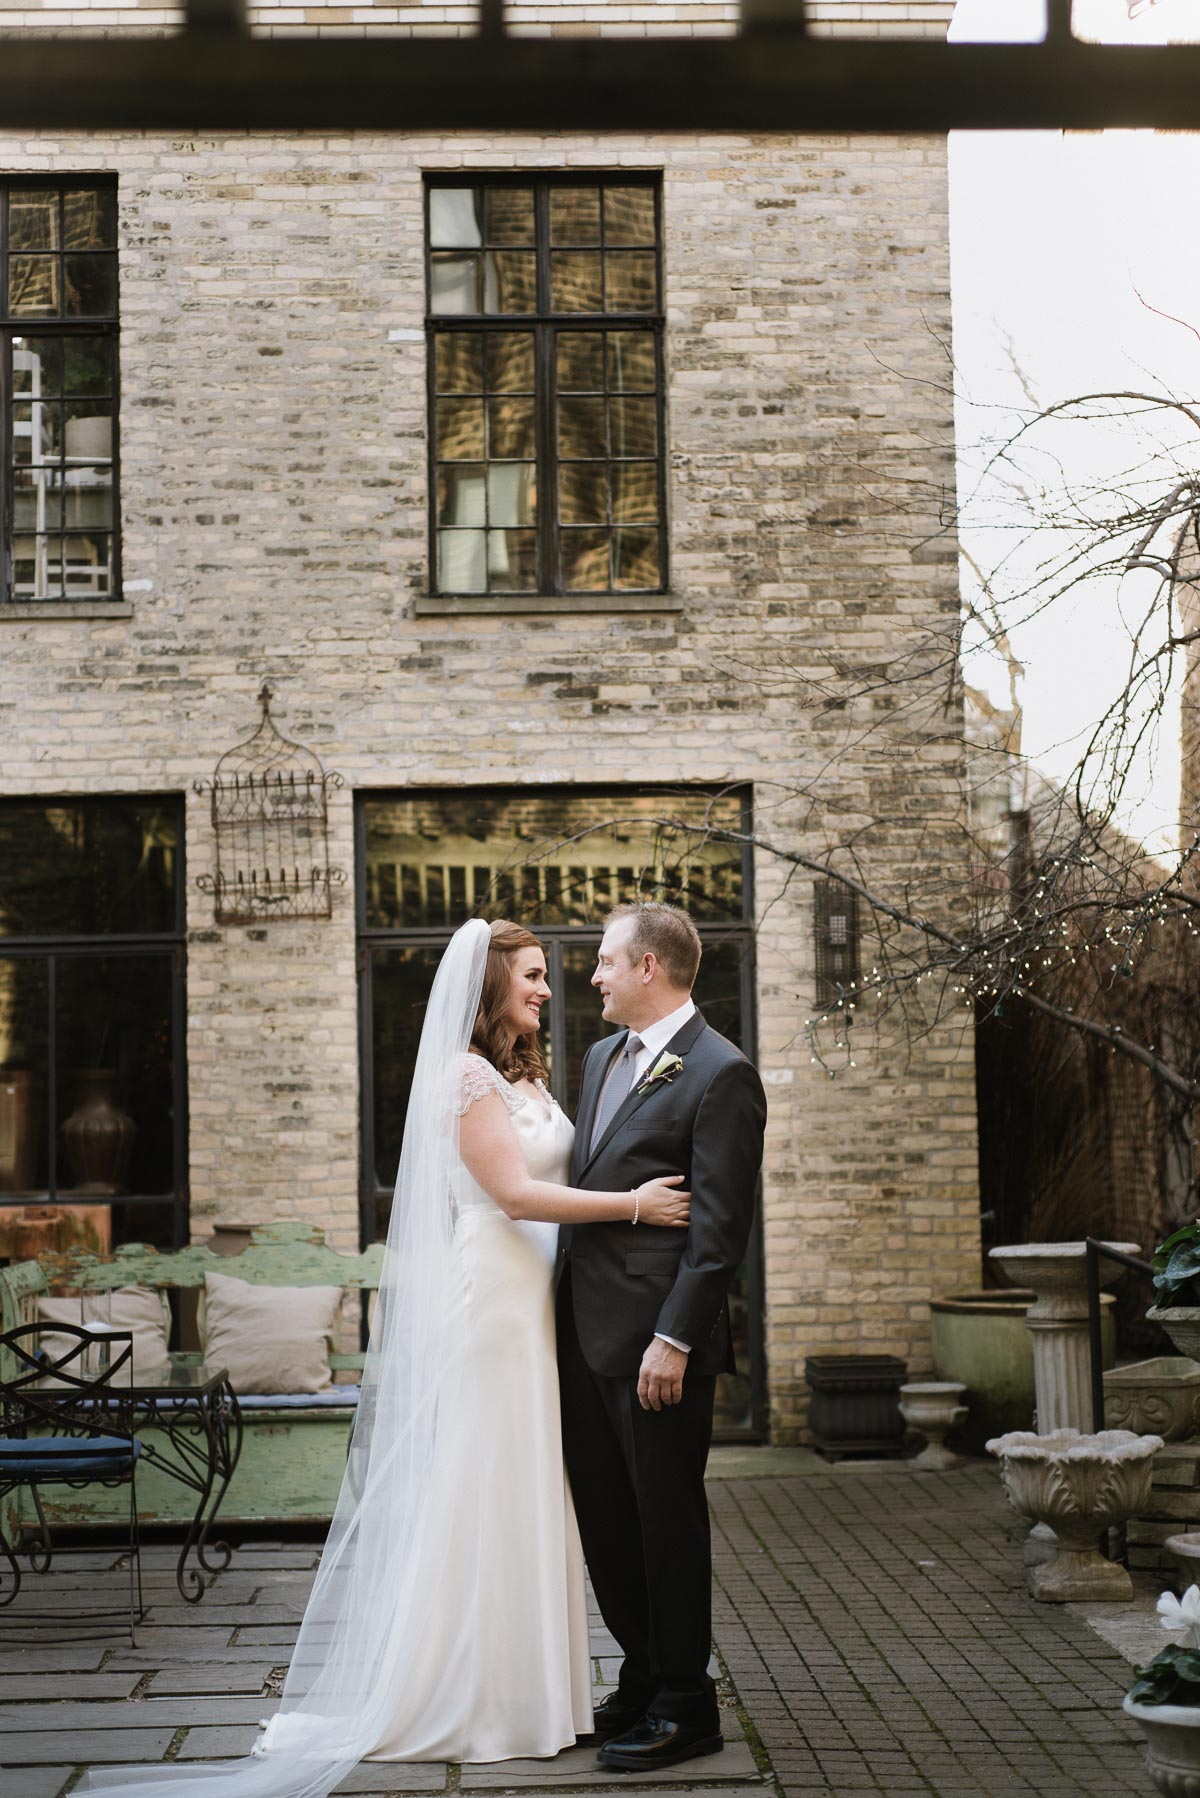 Pamela Yasuko Photography - A New Leaf Wedding - Chicago Oahu Photographer-25.jpg